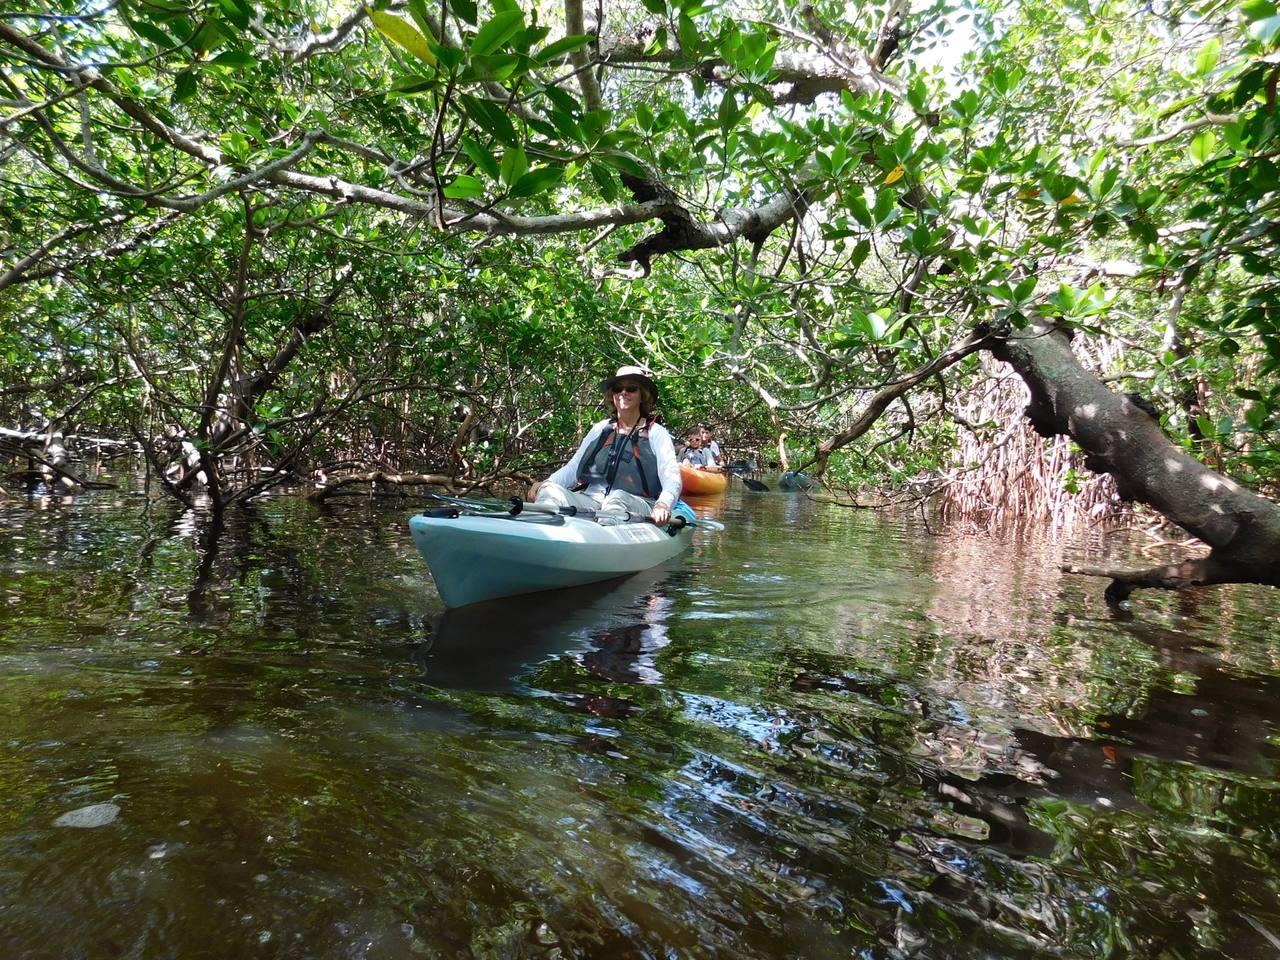 Rookery Bay Kayak Naples Floride 8406 Le Courrier De Floride